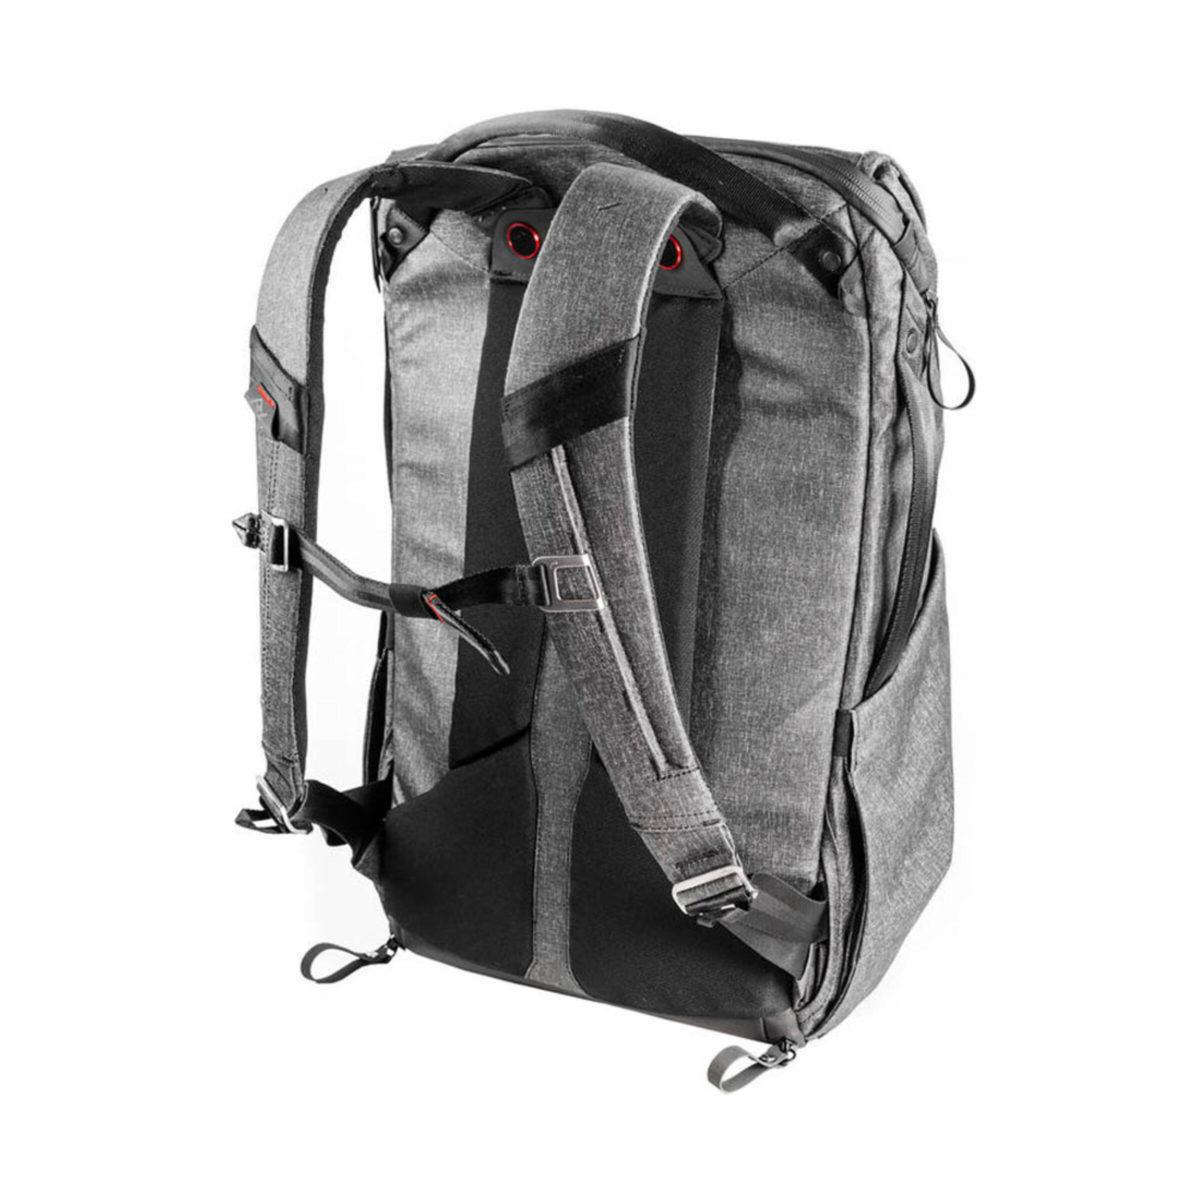 peak_design_everyday_backpack_30l_cc_04